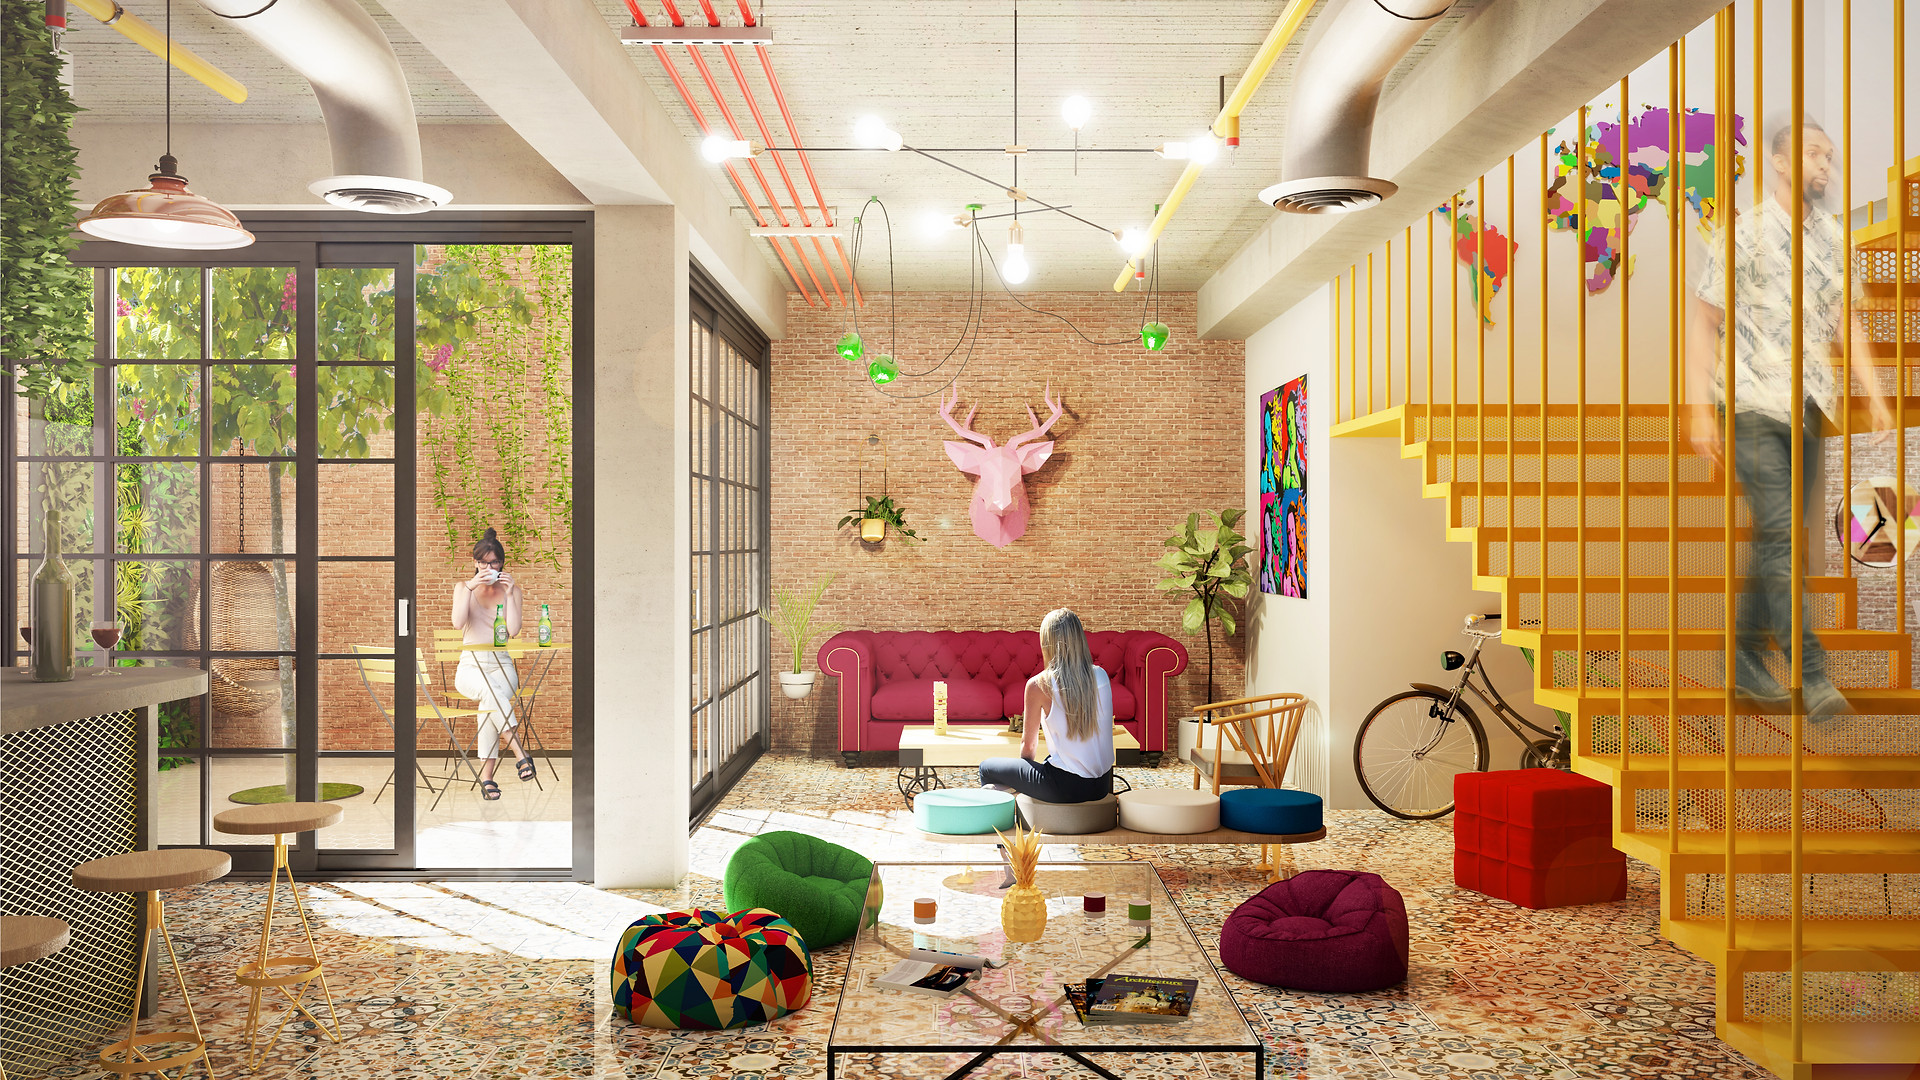 AMAC estudio-Hostel en Malaga-Lounge.jpg